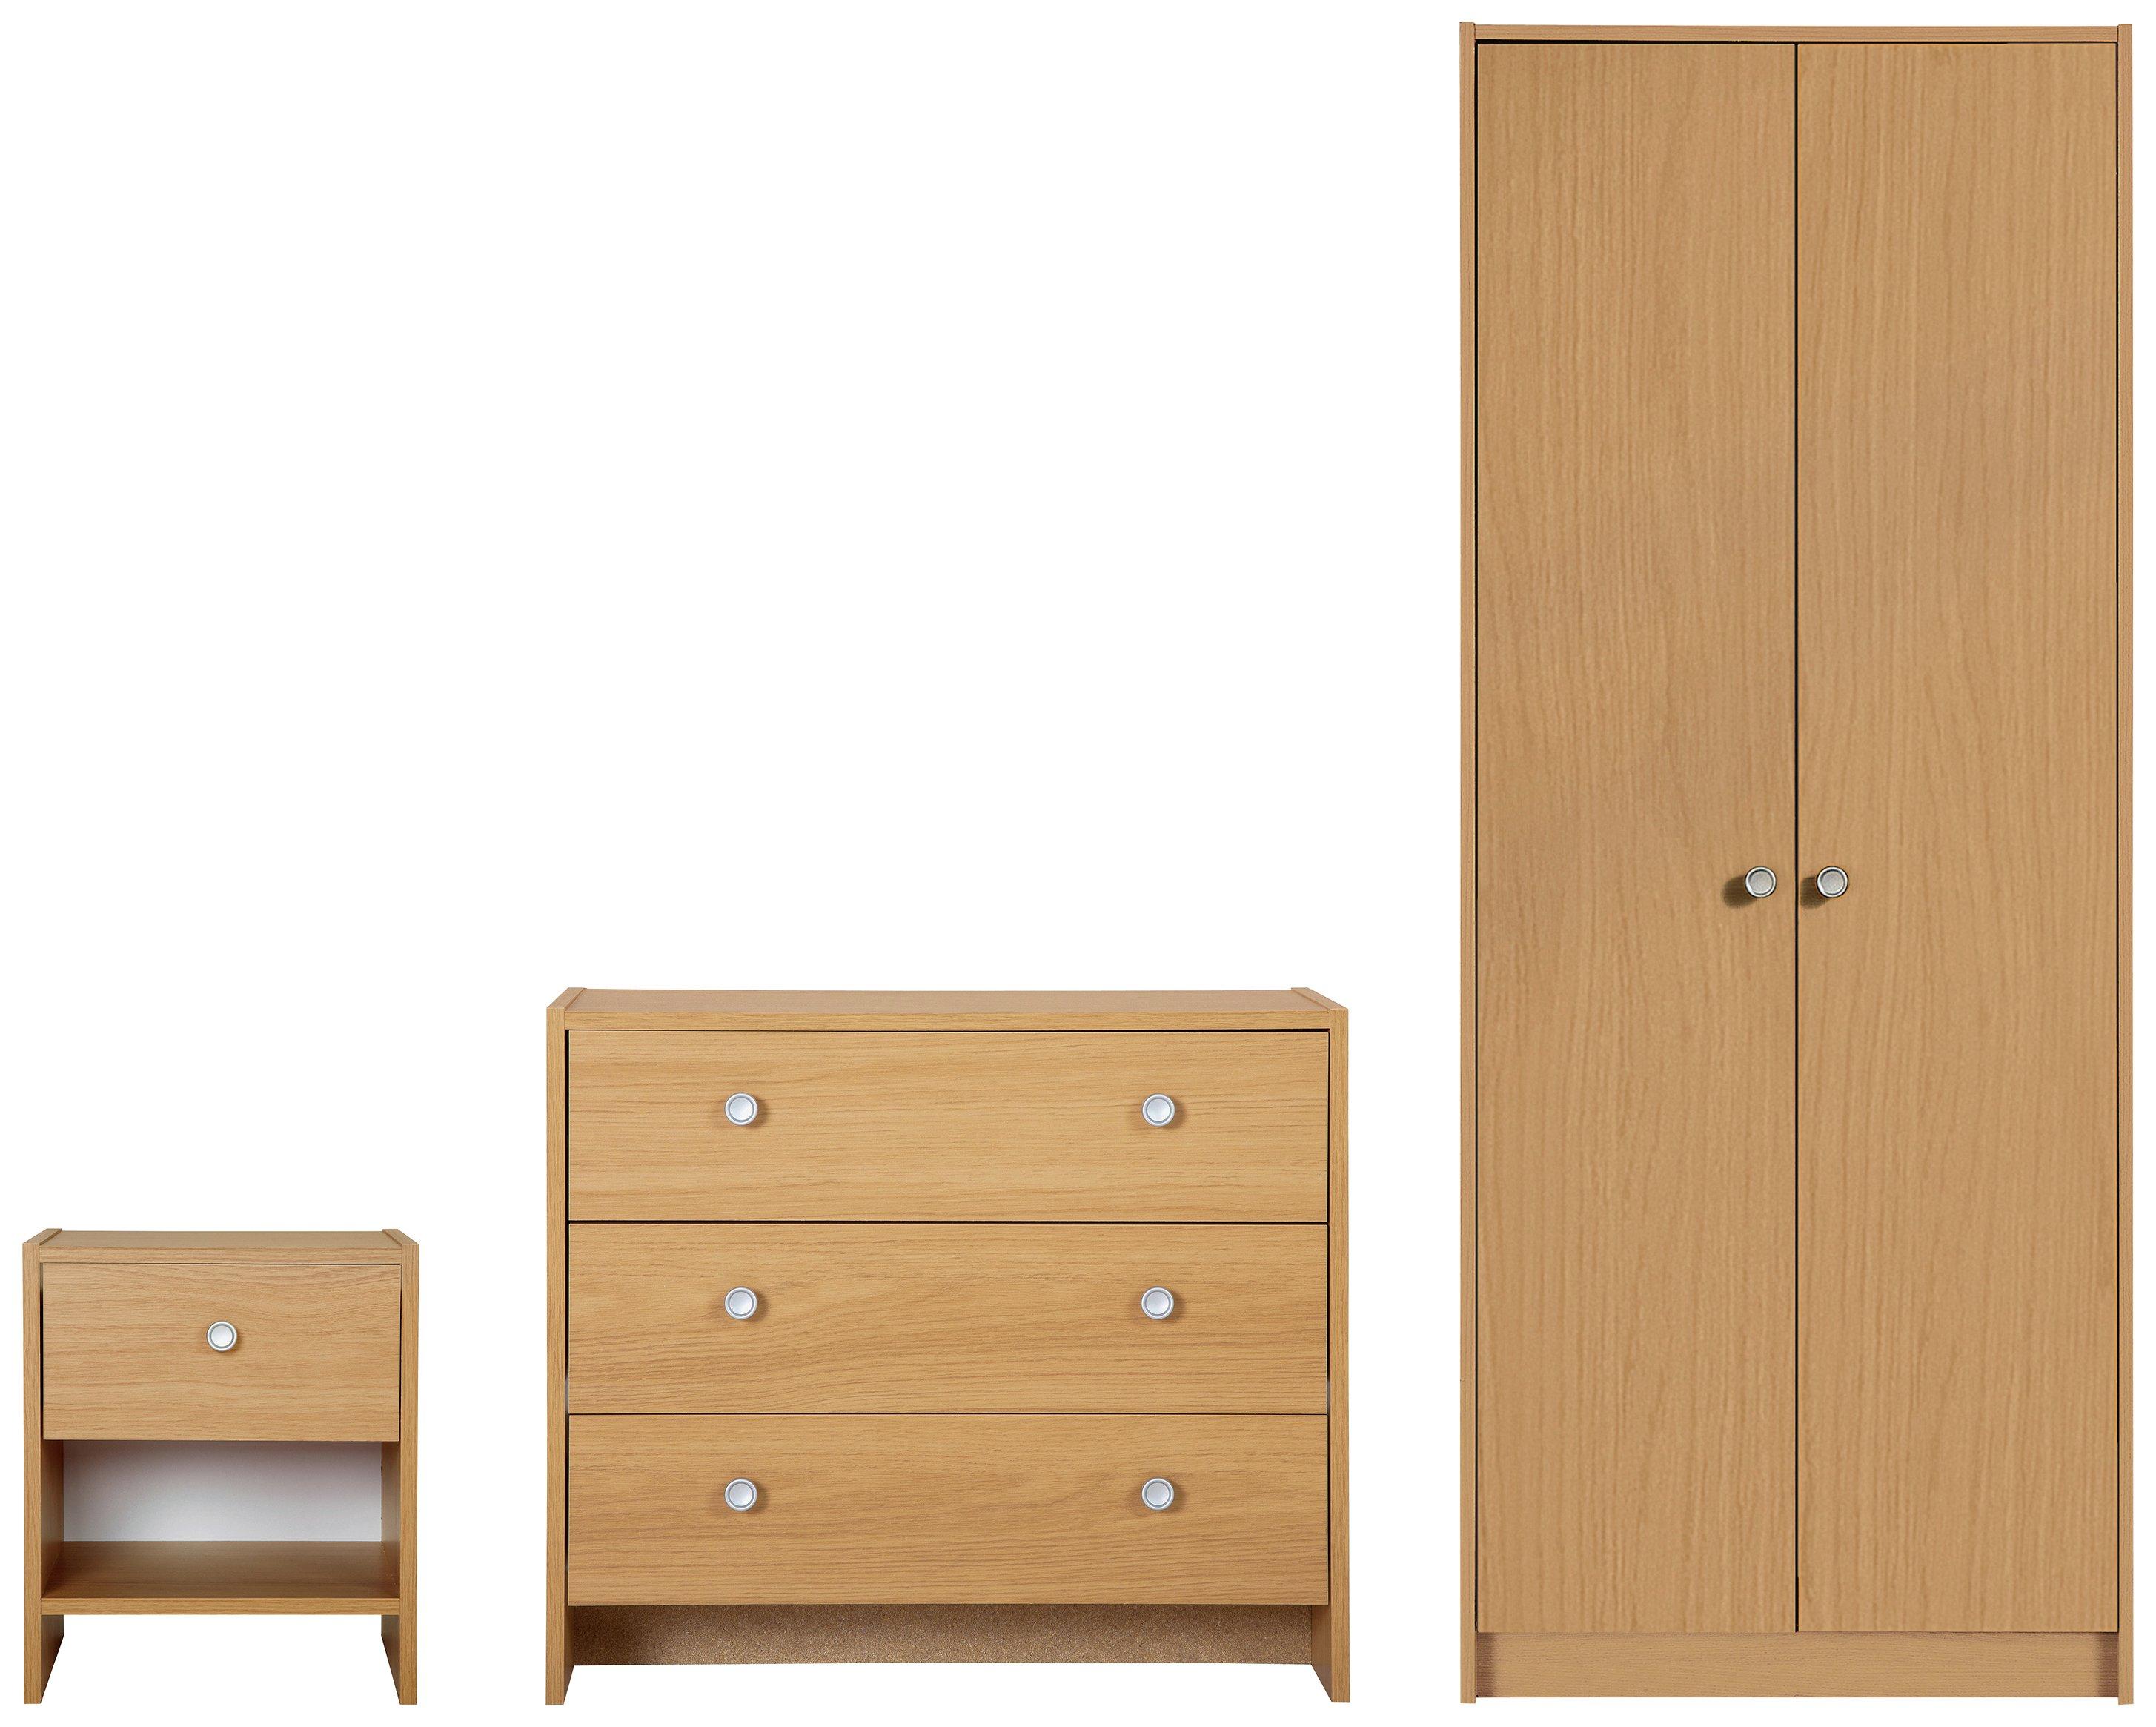 bedroom units argos. Black Bedroom Furniture Sets. Home Design Ideas